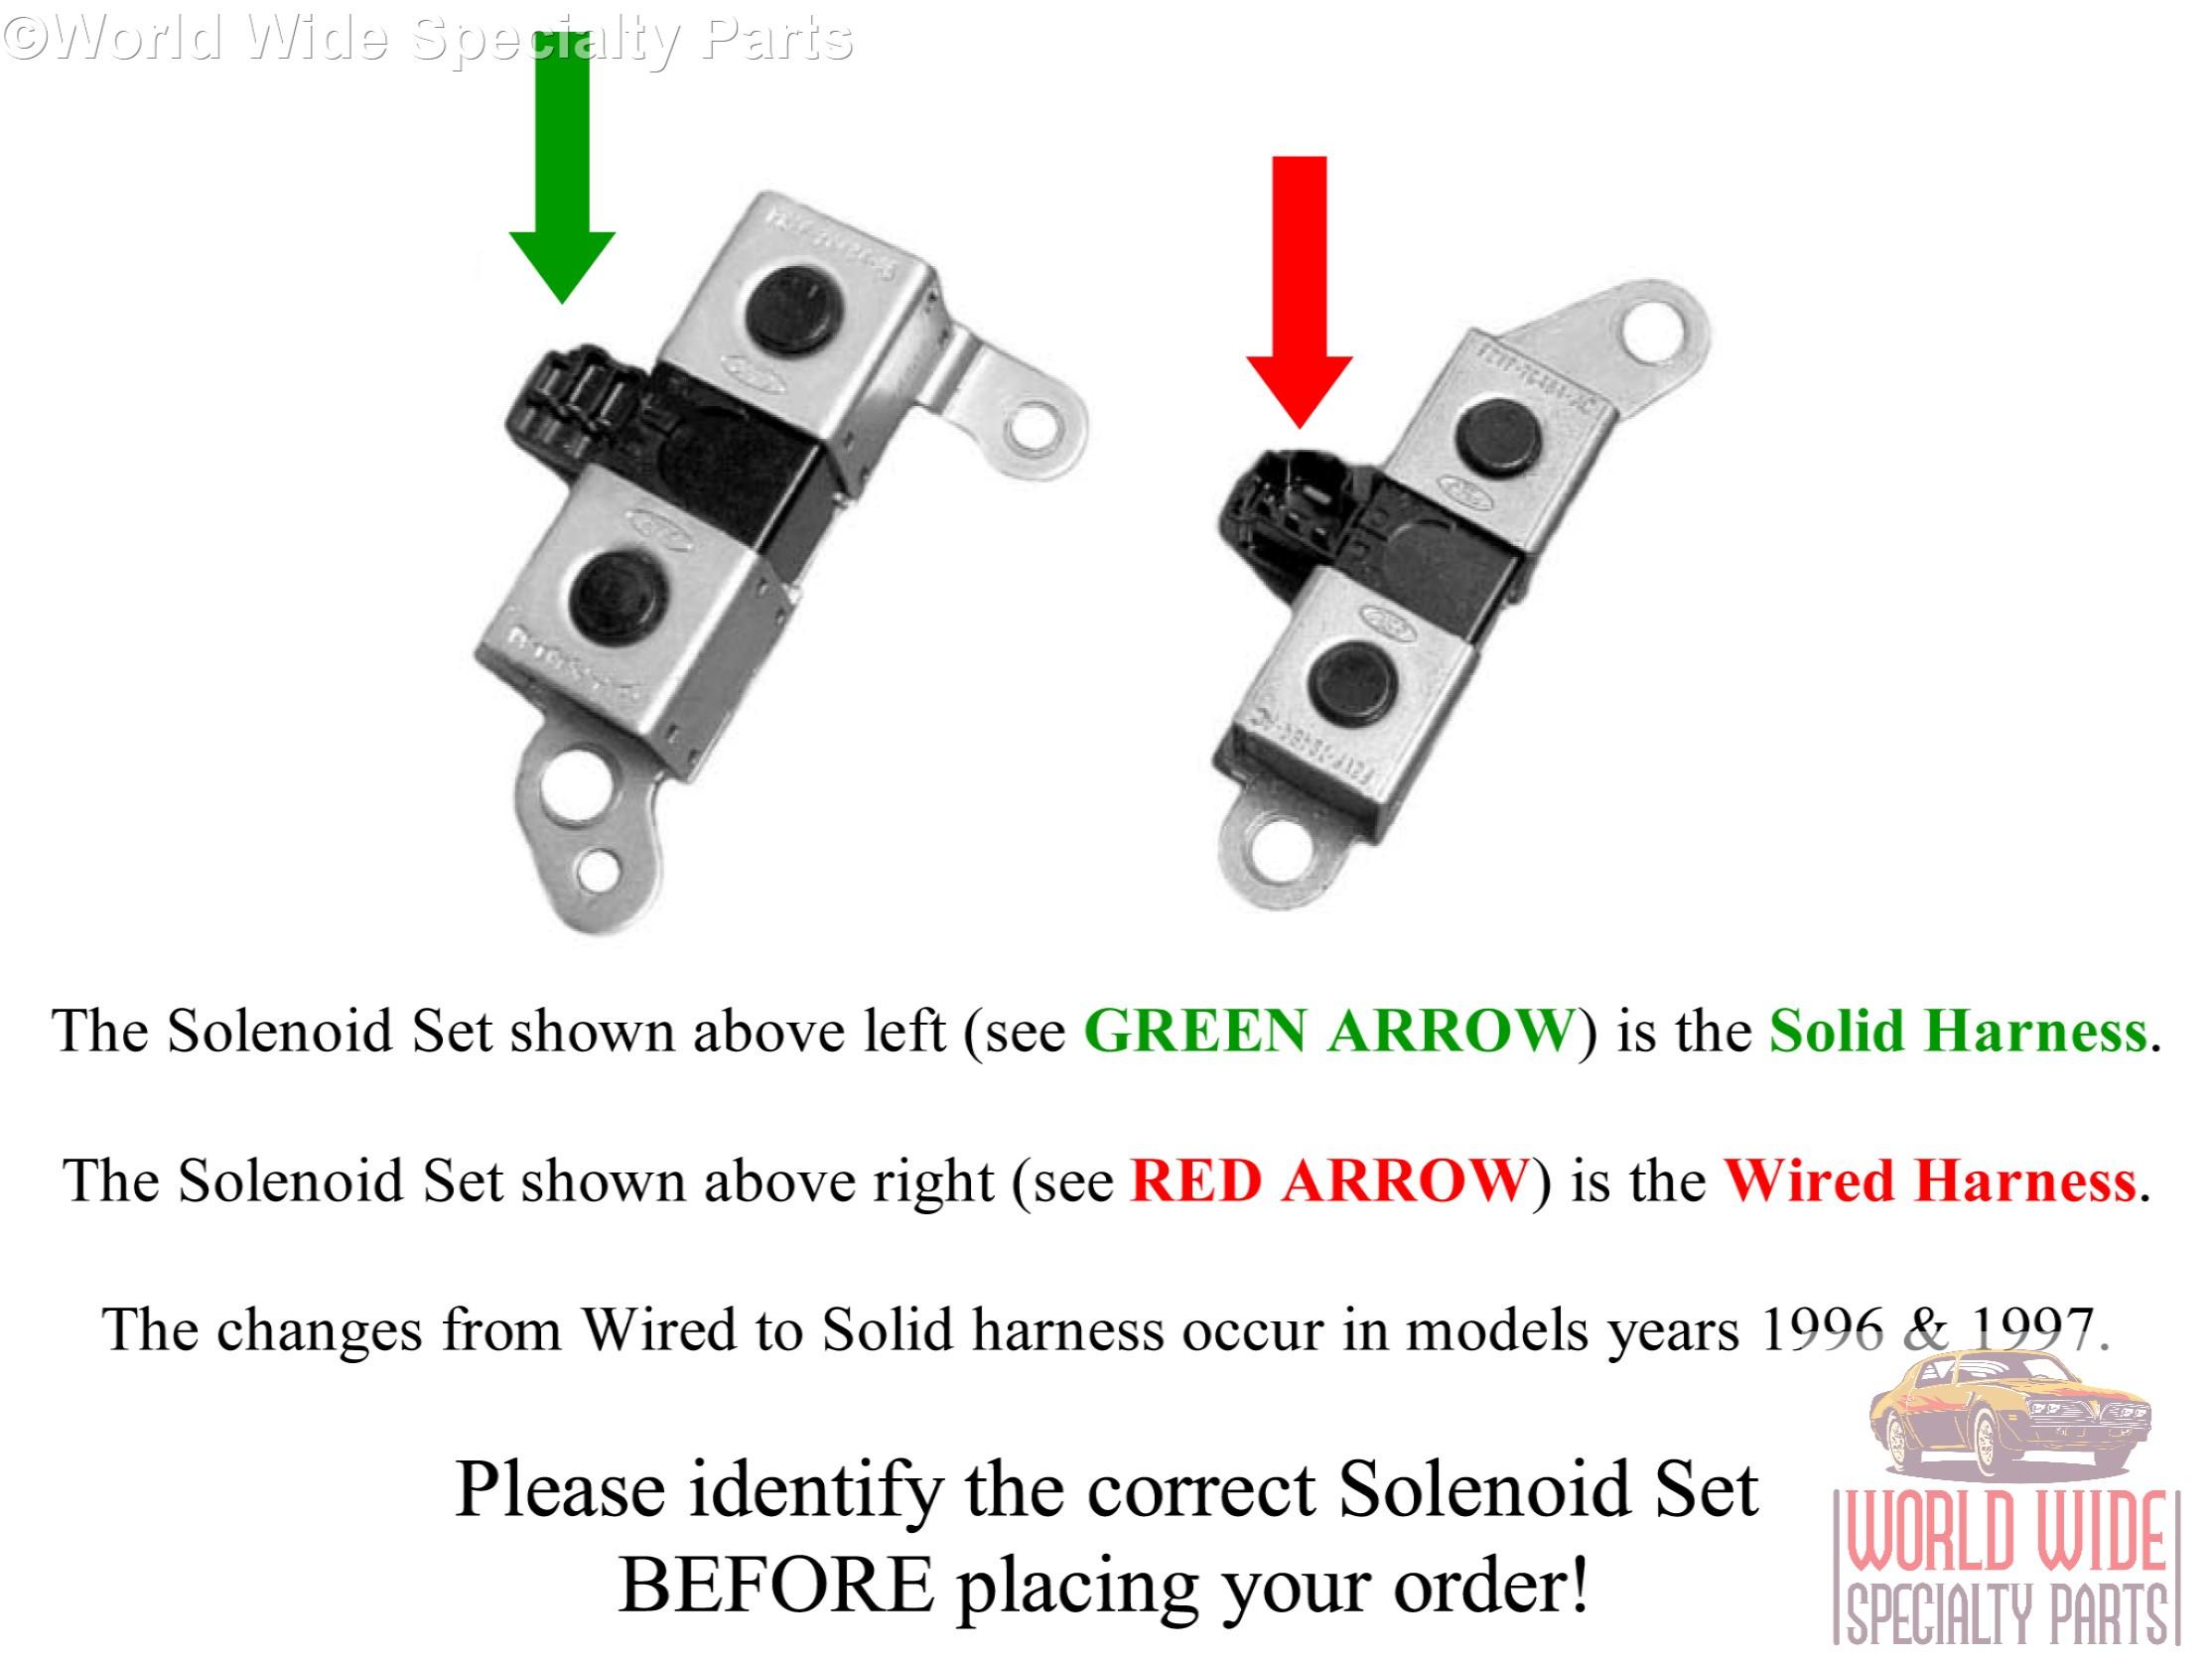 1998 ford f150 transmission diagram 2001 jaguar s type fuel pump wiring 4r70w valve body 2000 solid harness f6 cast